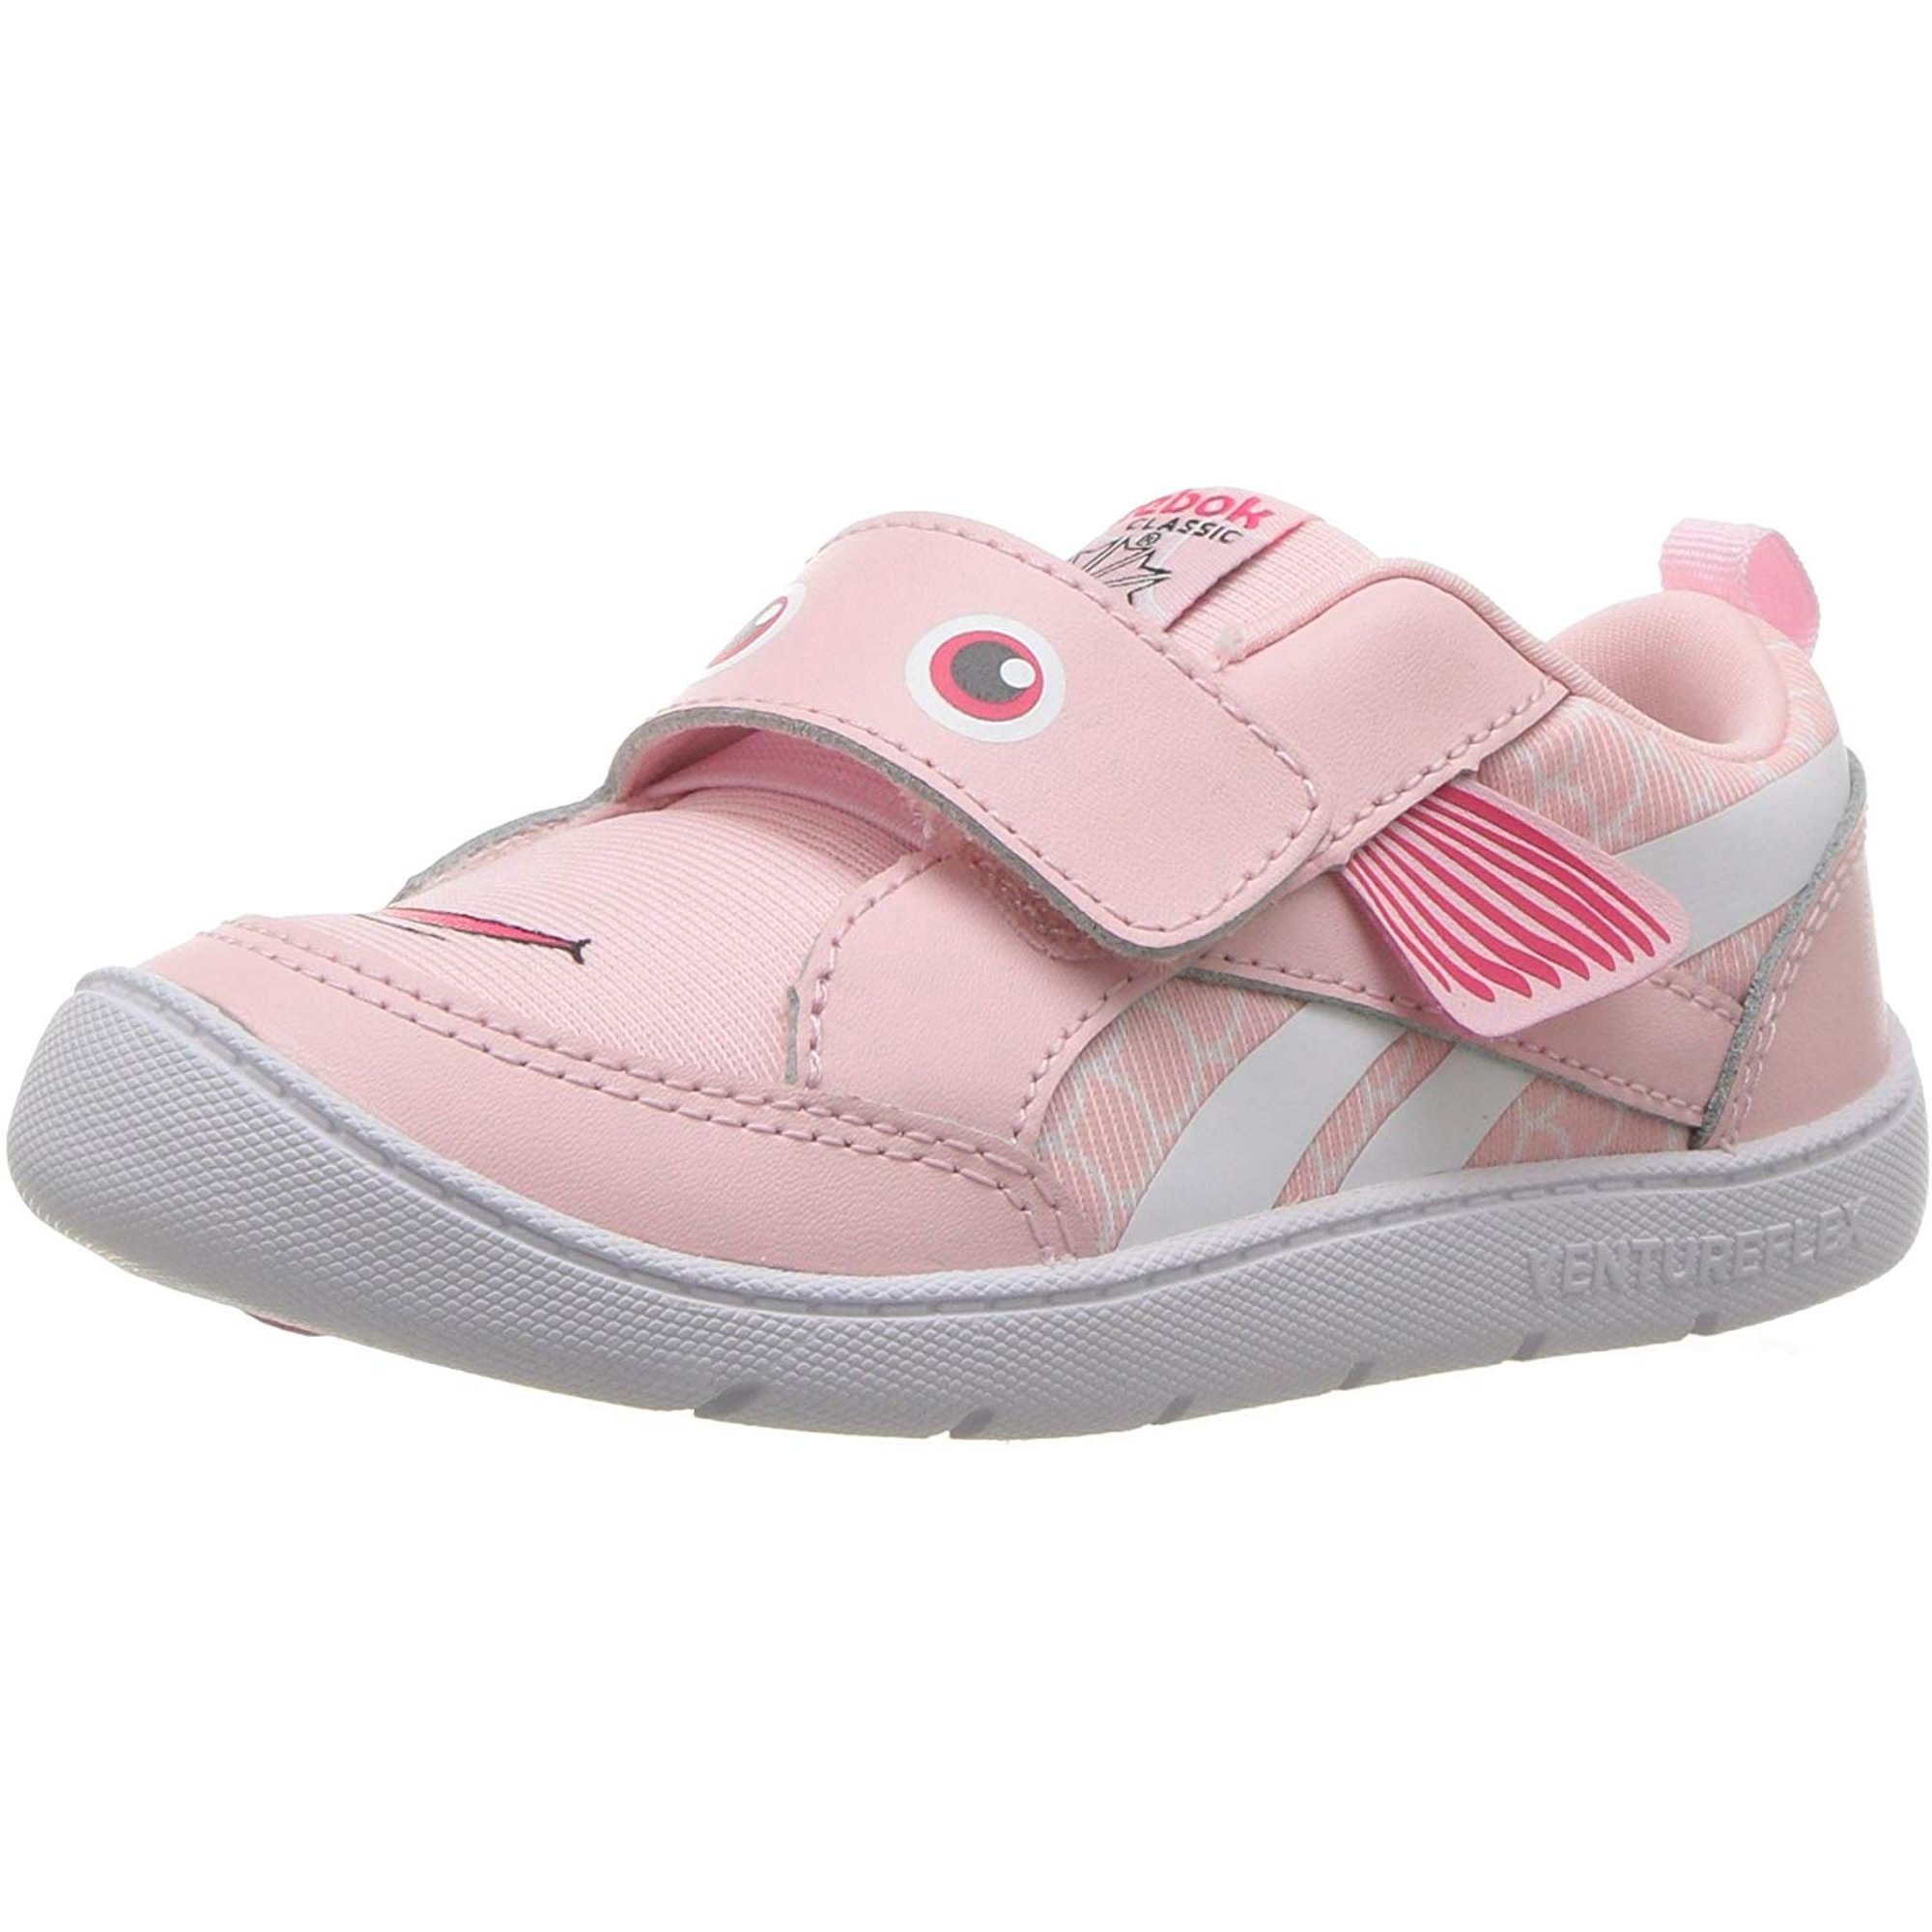 Fortalecer lotería Contribuir  Reebok Baby Ventureflex Chase Ii Sneaker, Fish-Practical Pink/White, 7.5 M  US Toddler | Walmart Canada